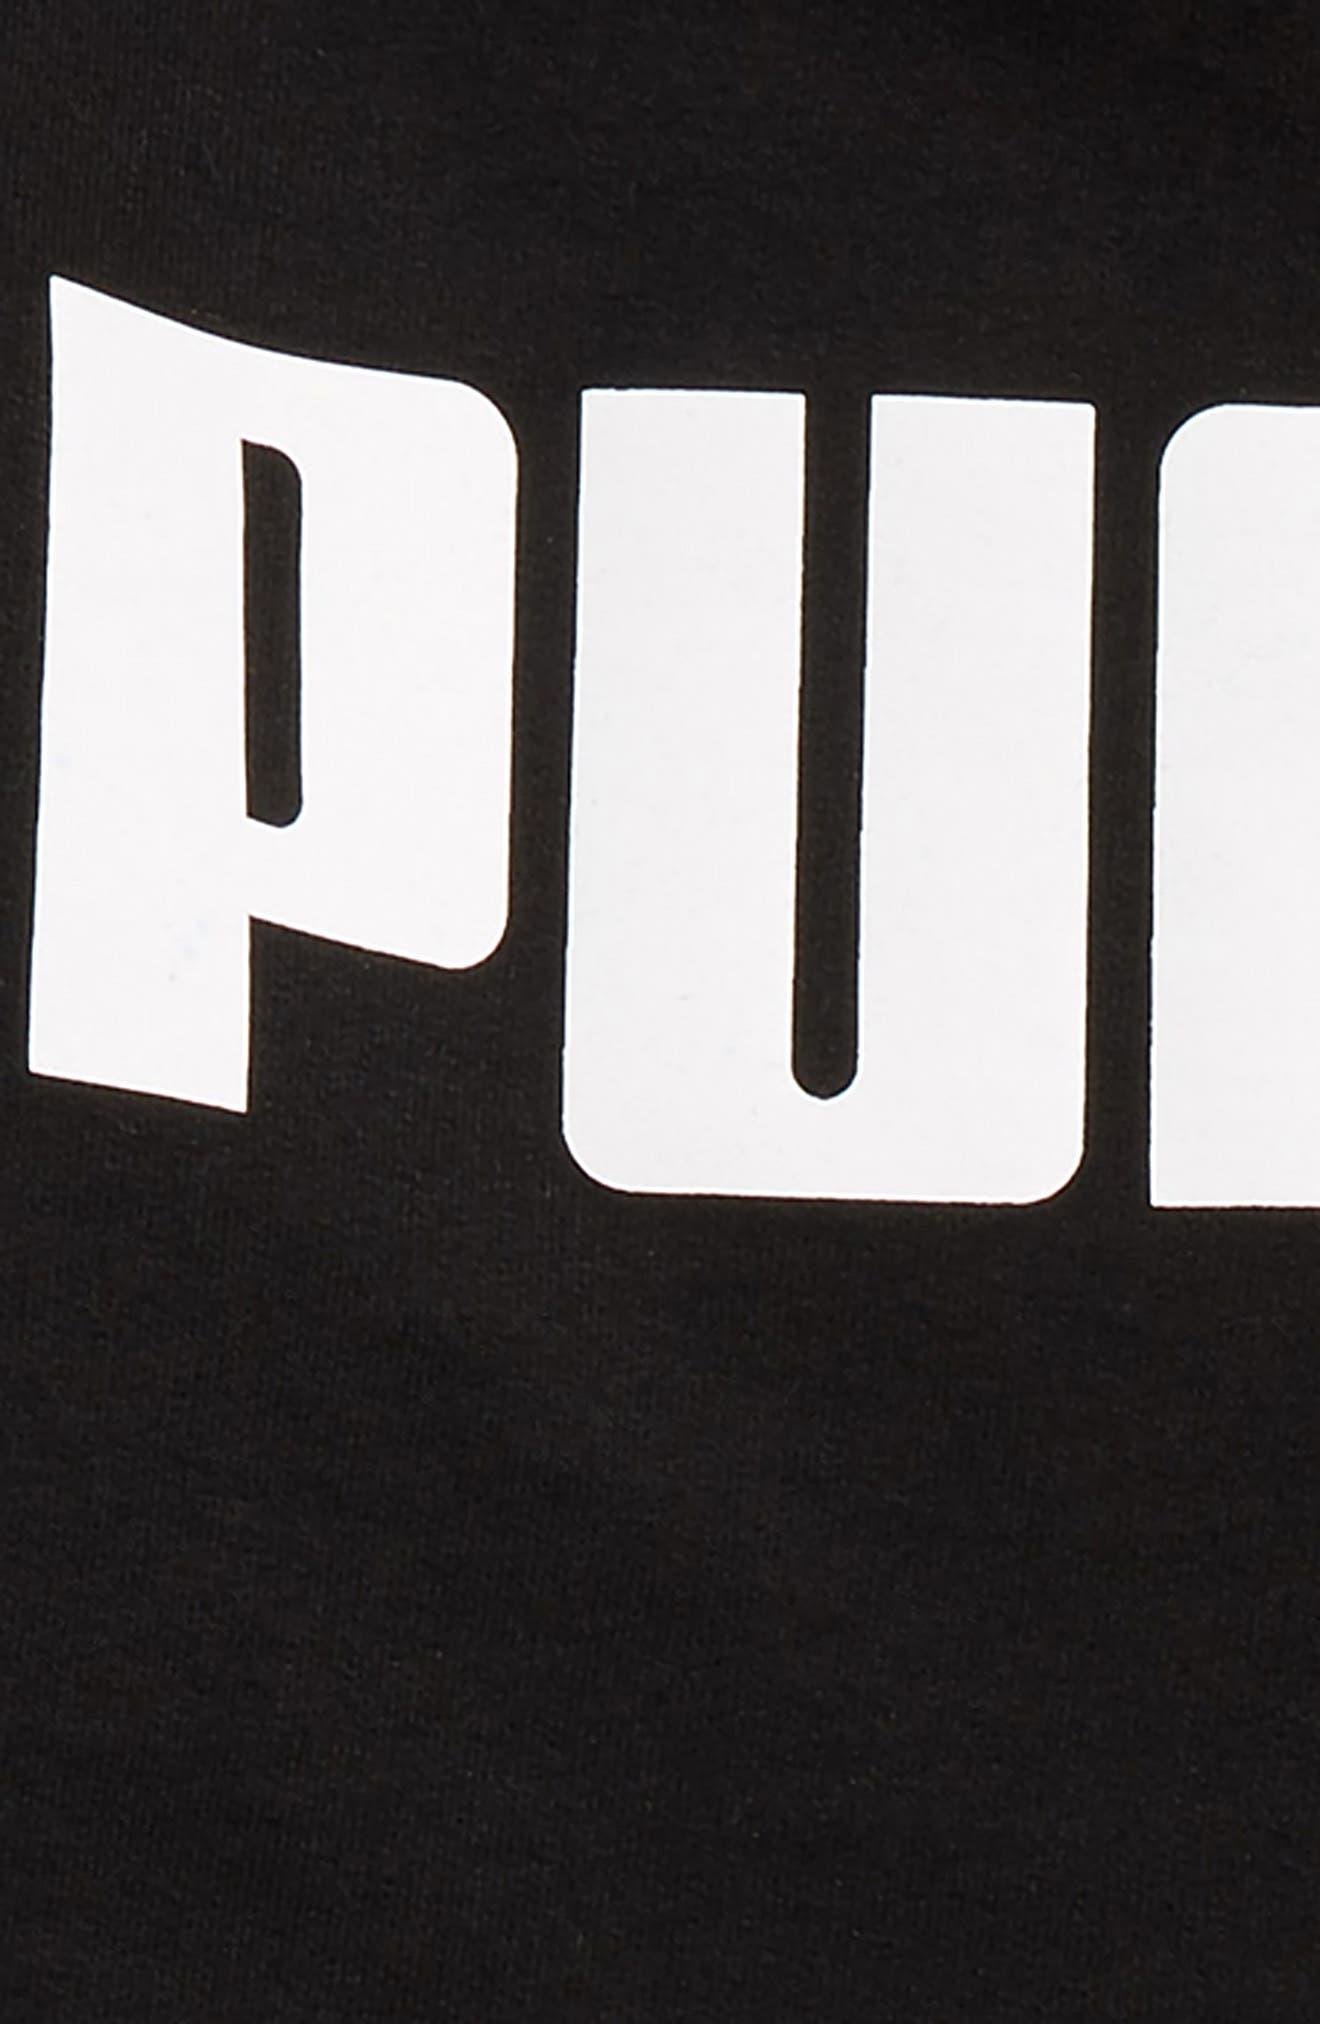 Rebel Logo Sweatshirt & Sweatpants Set,                             Alternate thumbnail 2, color,                             001